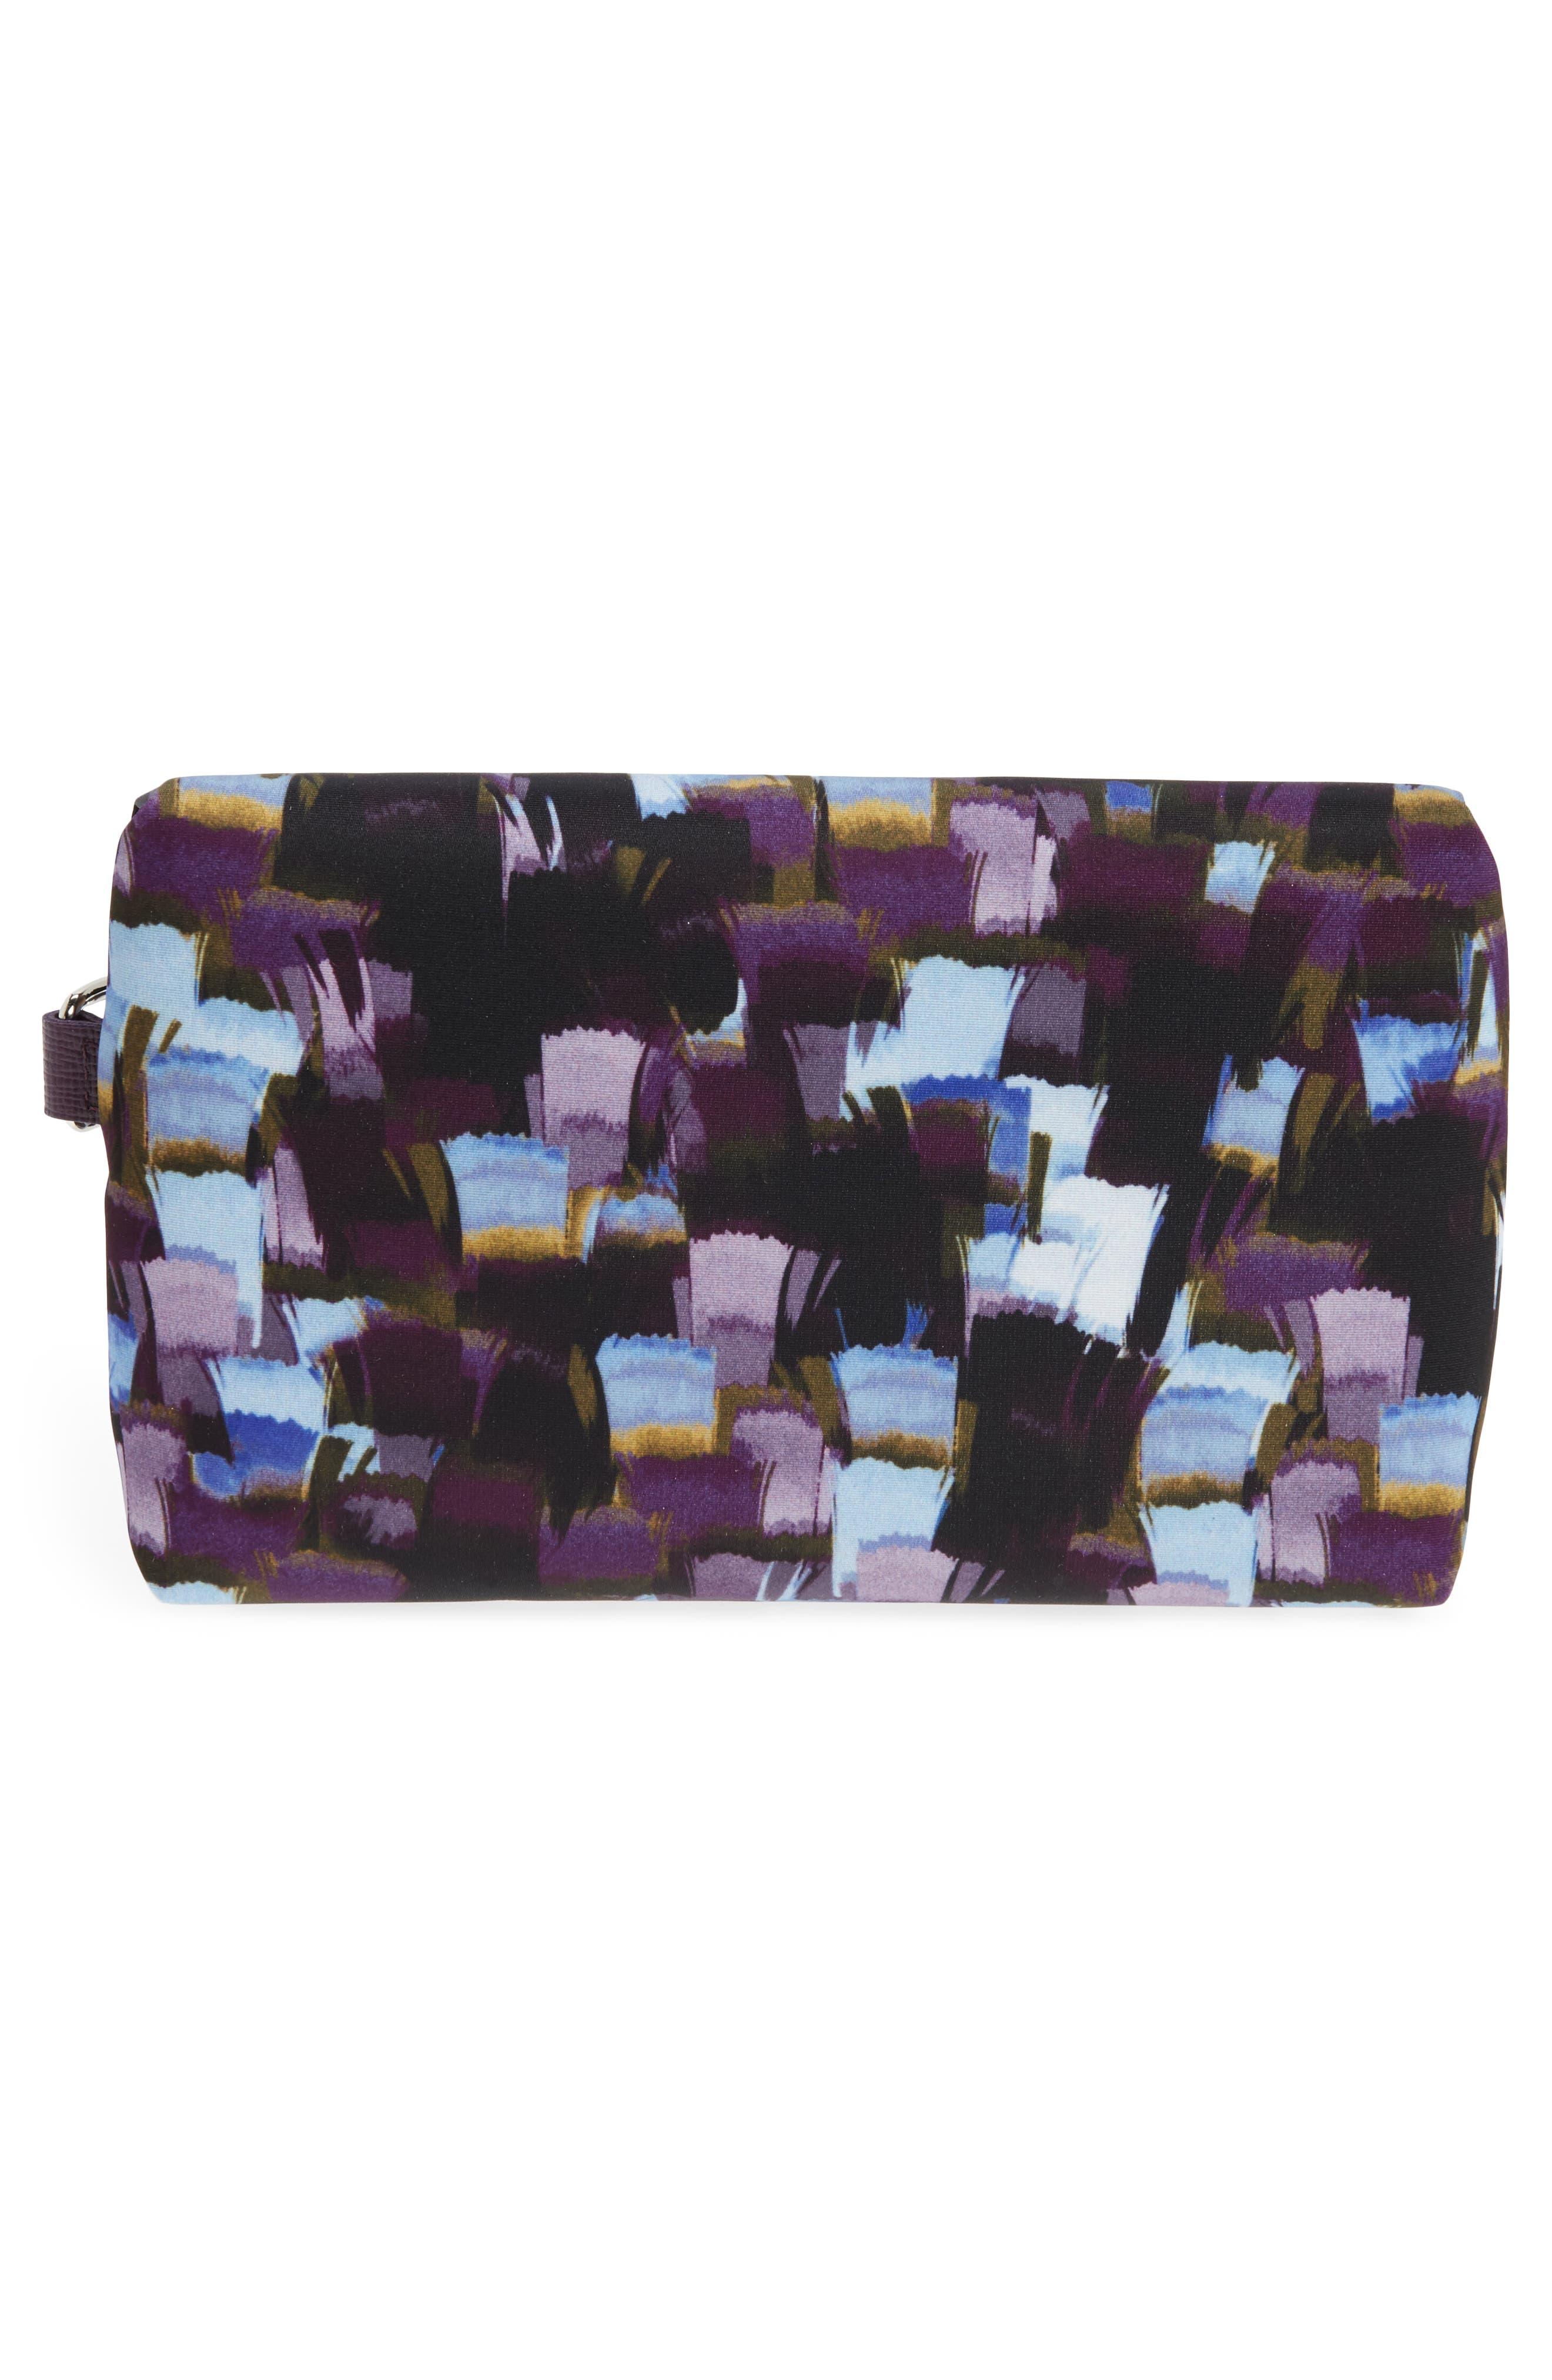 Le Pliage Neo - Vibrations Nylon Cosmetics Case,                             Alternate thumbnail 2, color,                             500